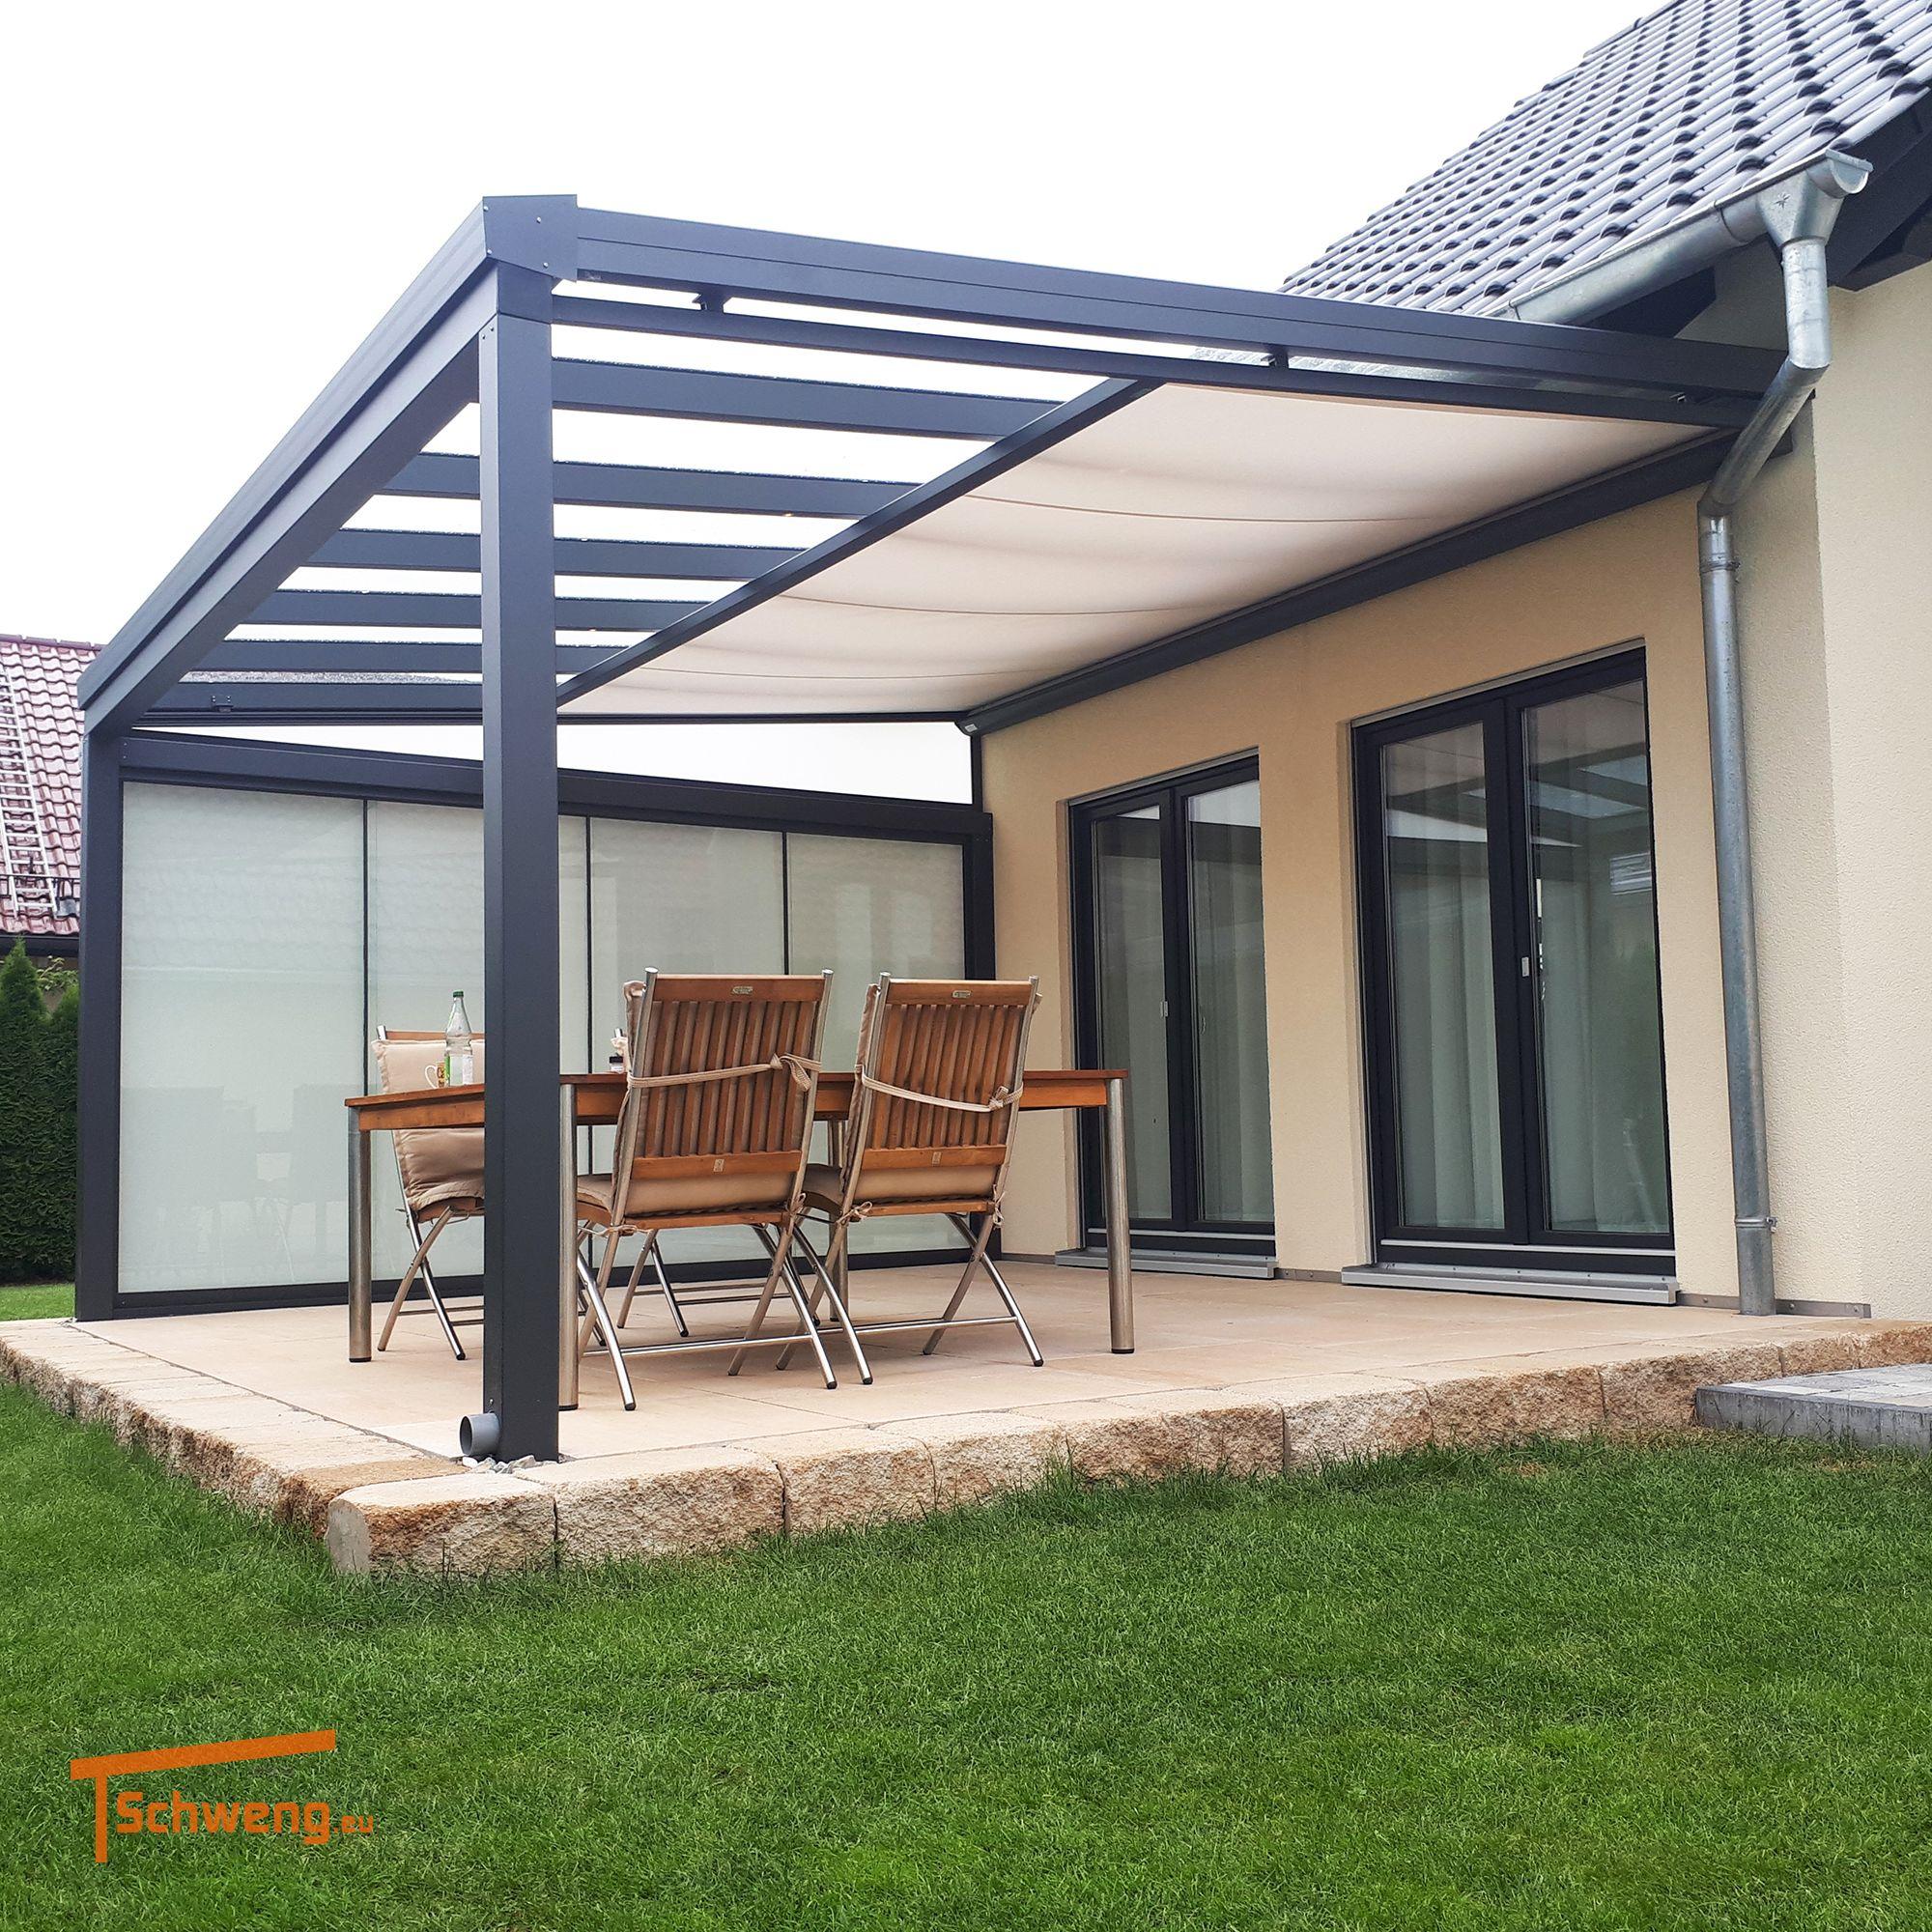 Schweng Terrassenüberdachung Aus Aluminium Mit 8Mm ... avec Pergola Alu Pour Mobil Home